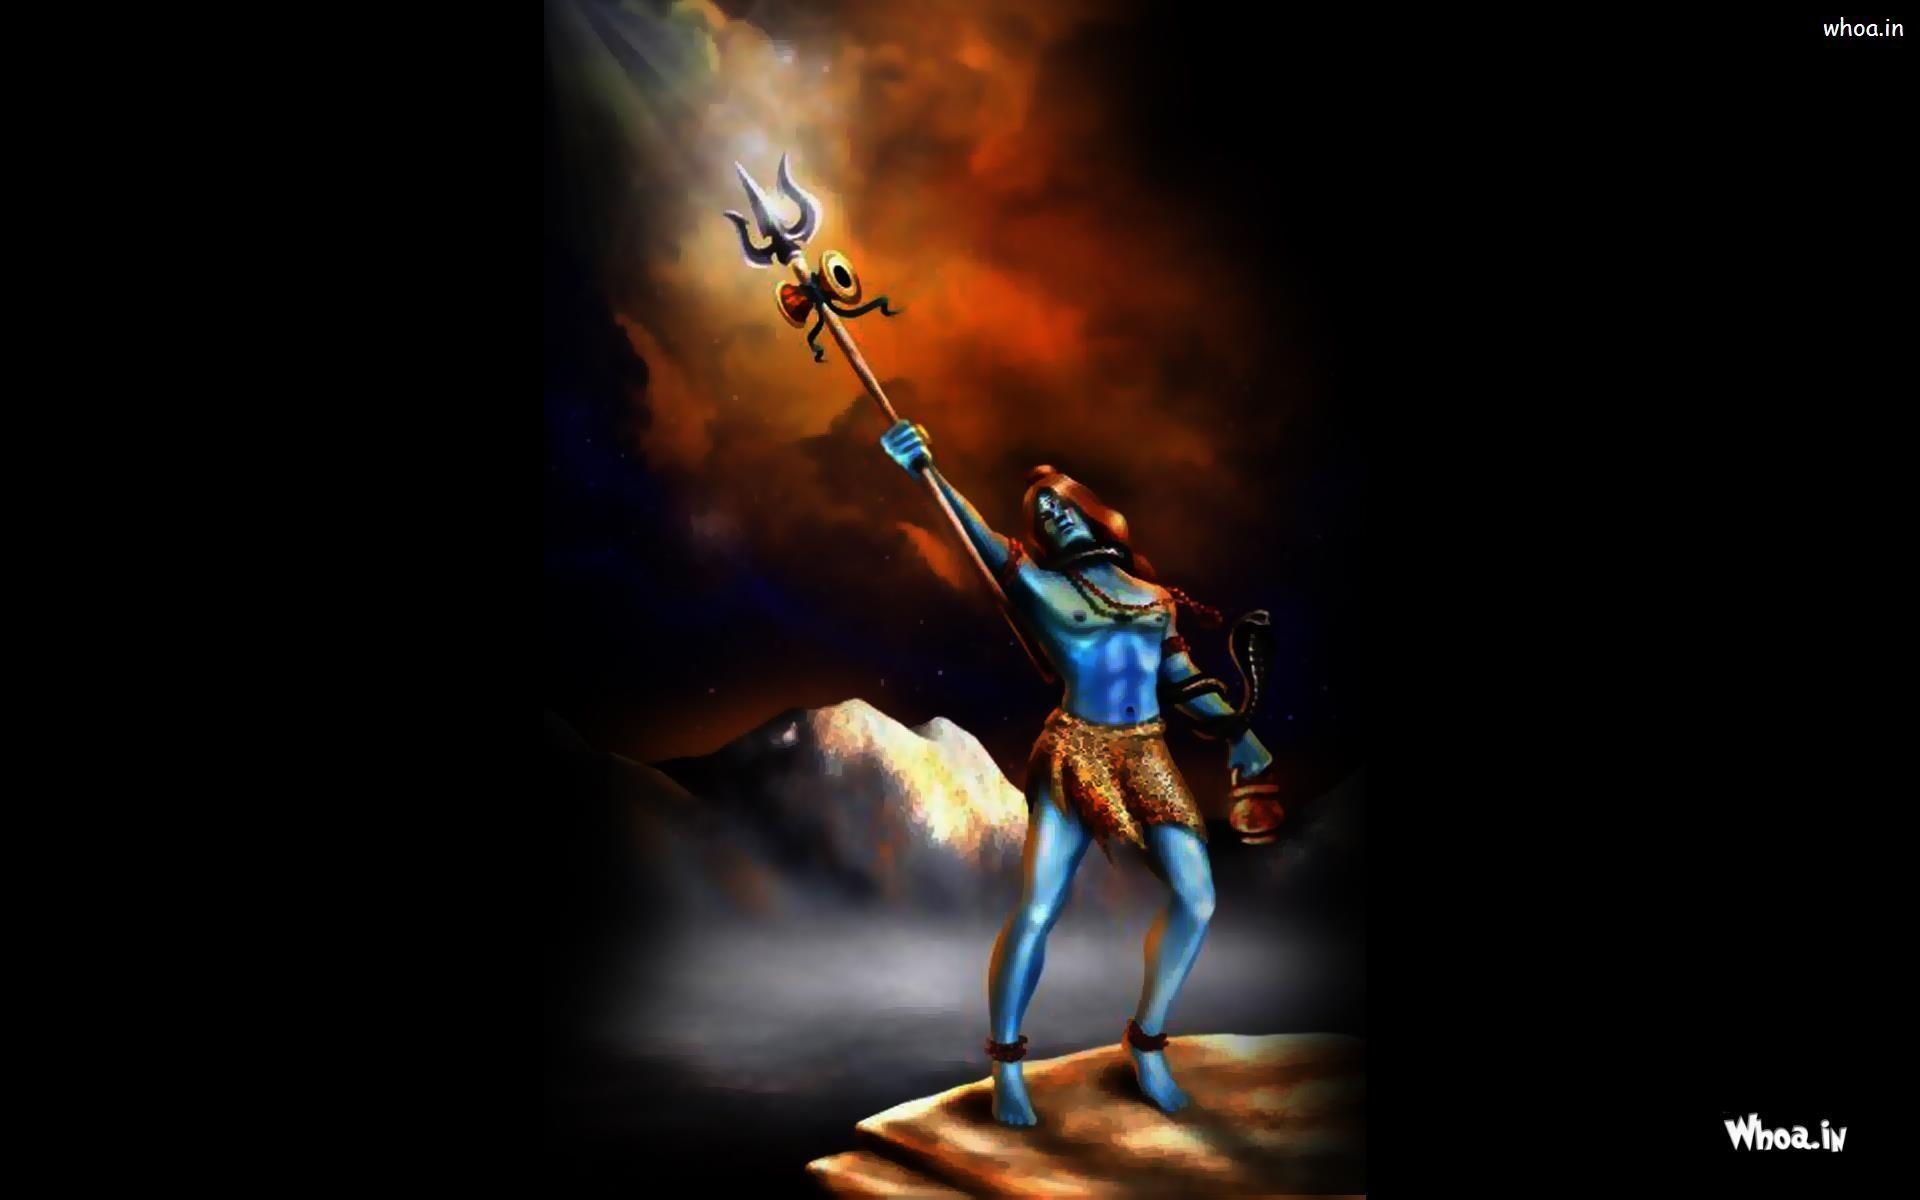 lord shiva wallpaper hd download mahadev hd wallpaper shiva hd wallpaper lord shiva wallpaper hd download